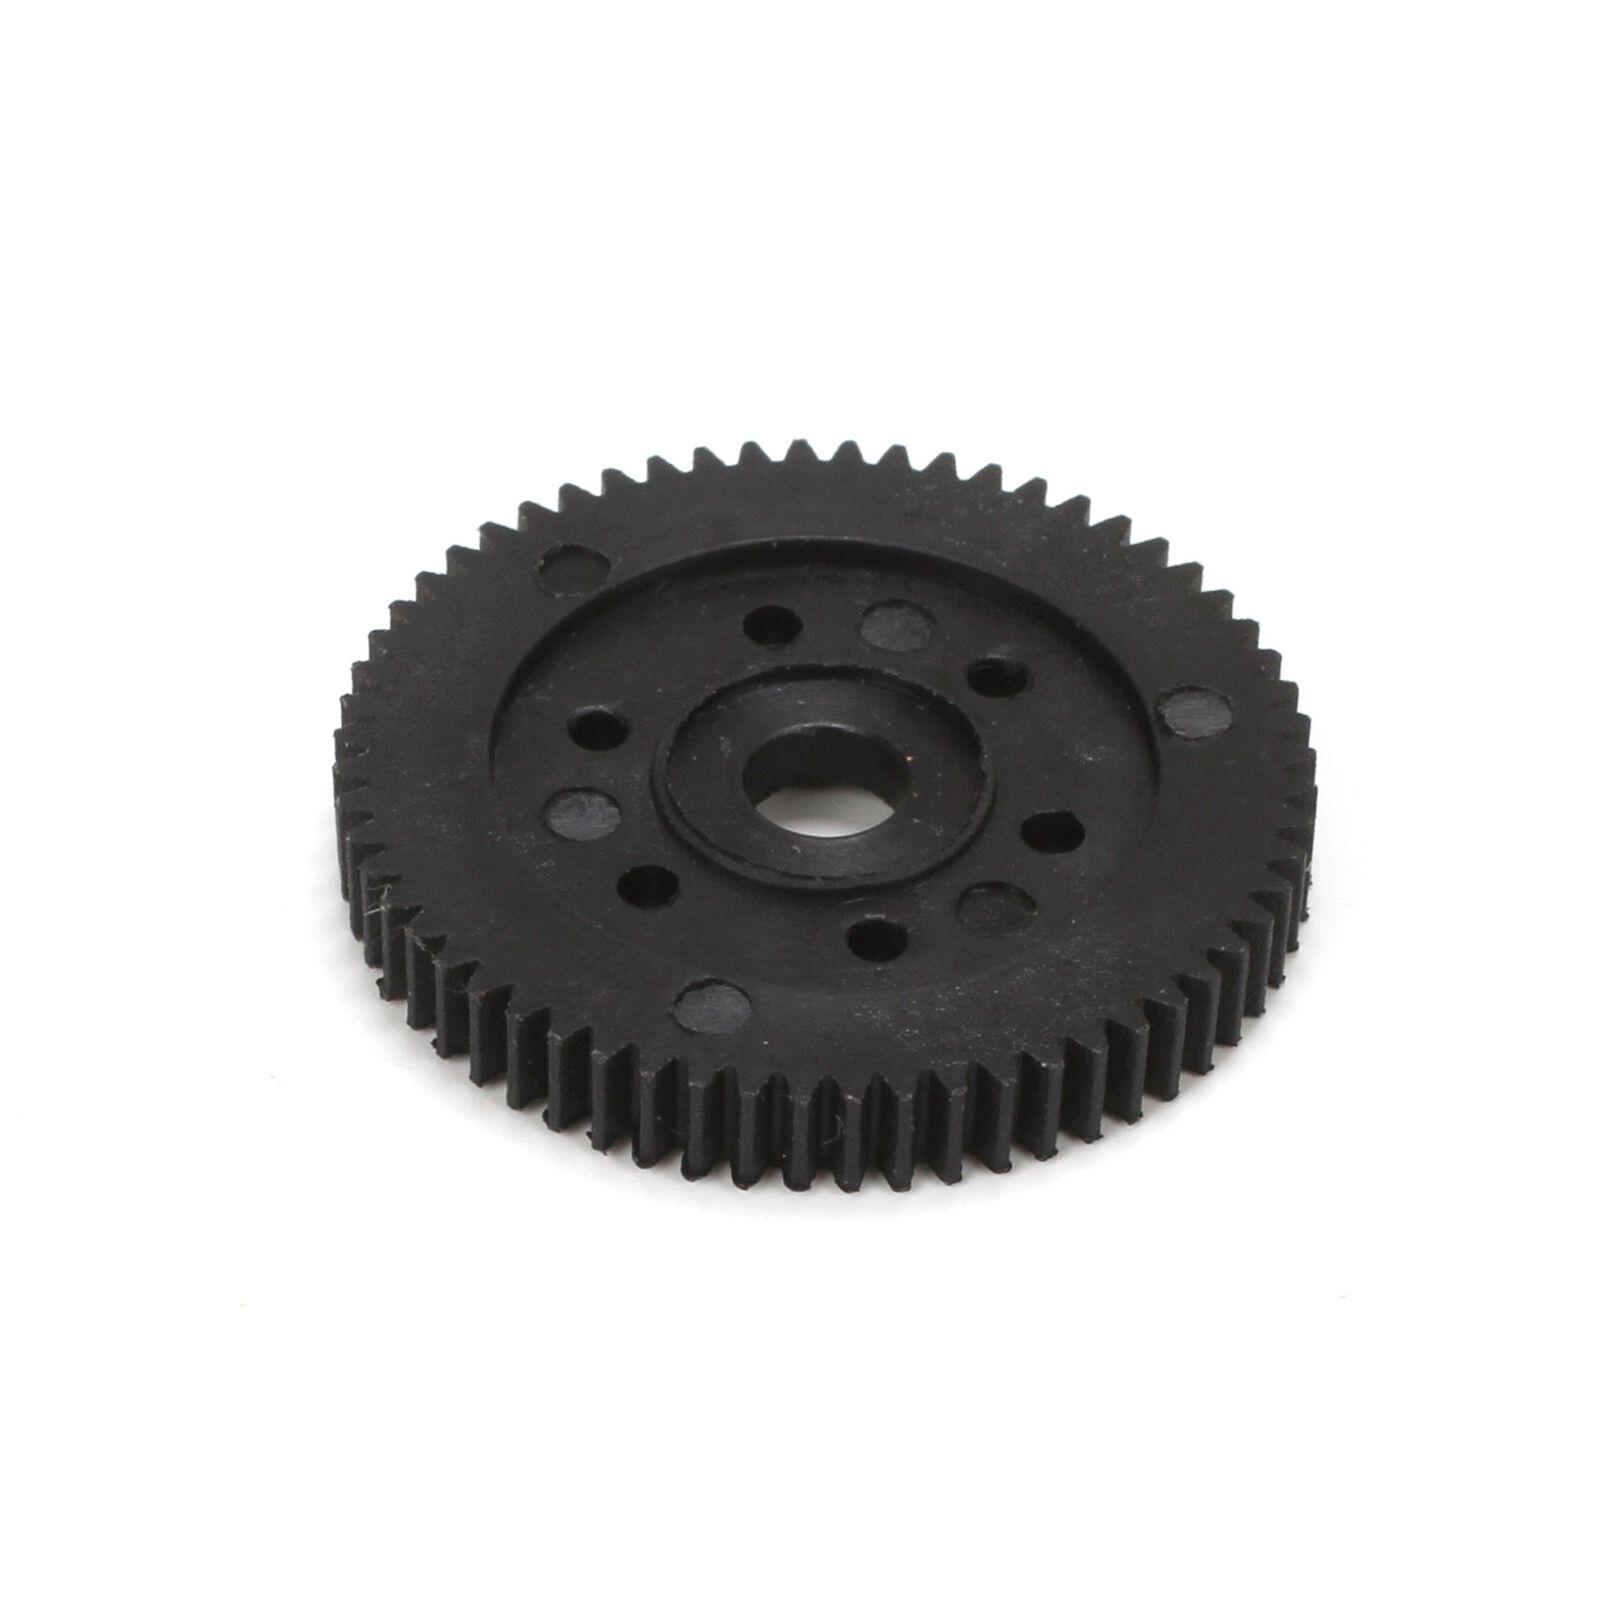 Spur Gear 48P 60T(1): 1/18 4WD Temper, 1.9 Barrage Kit/RTR, Doomsday, Barrage 2.0